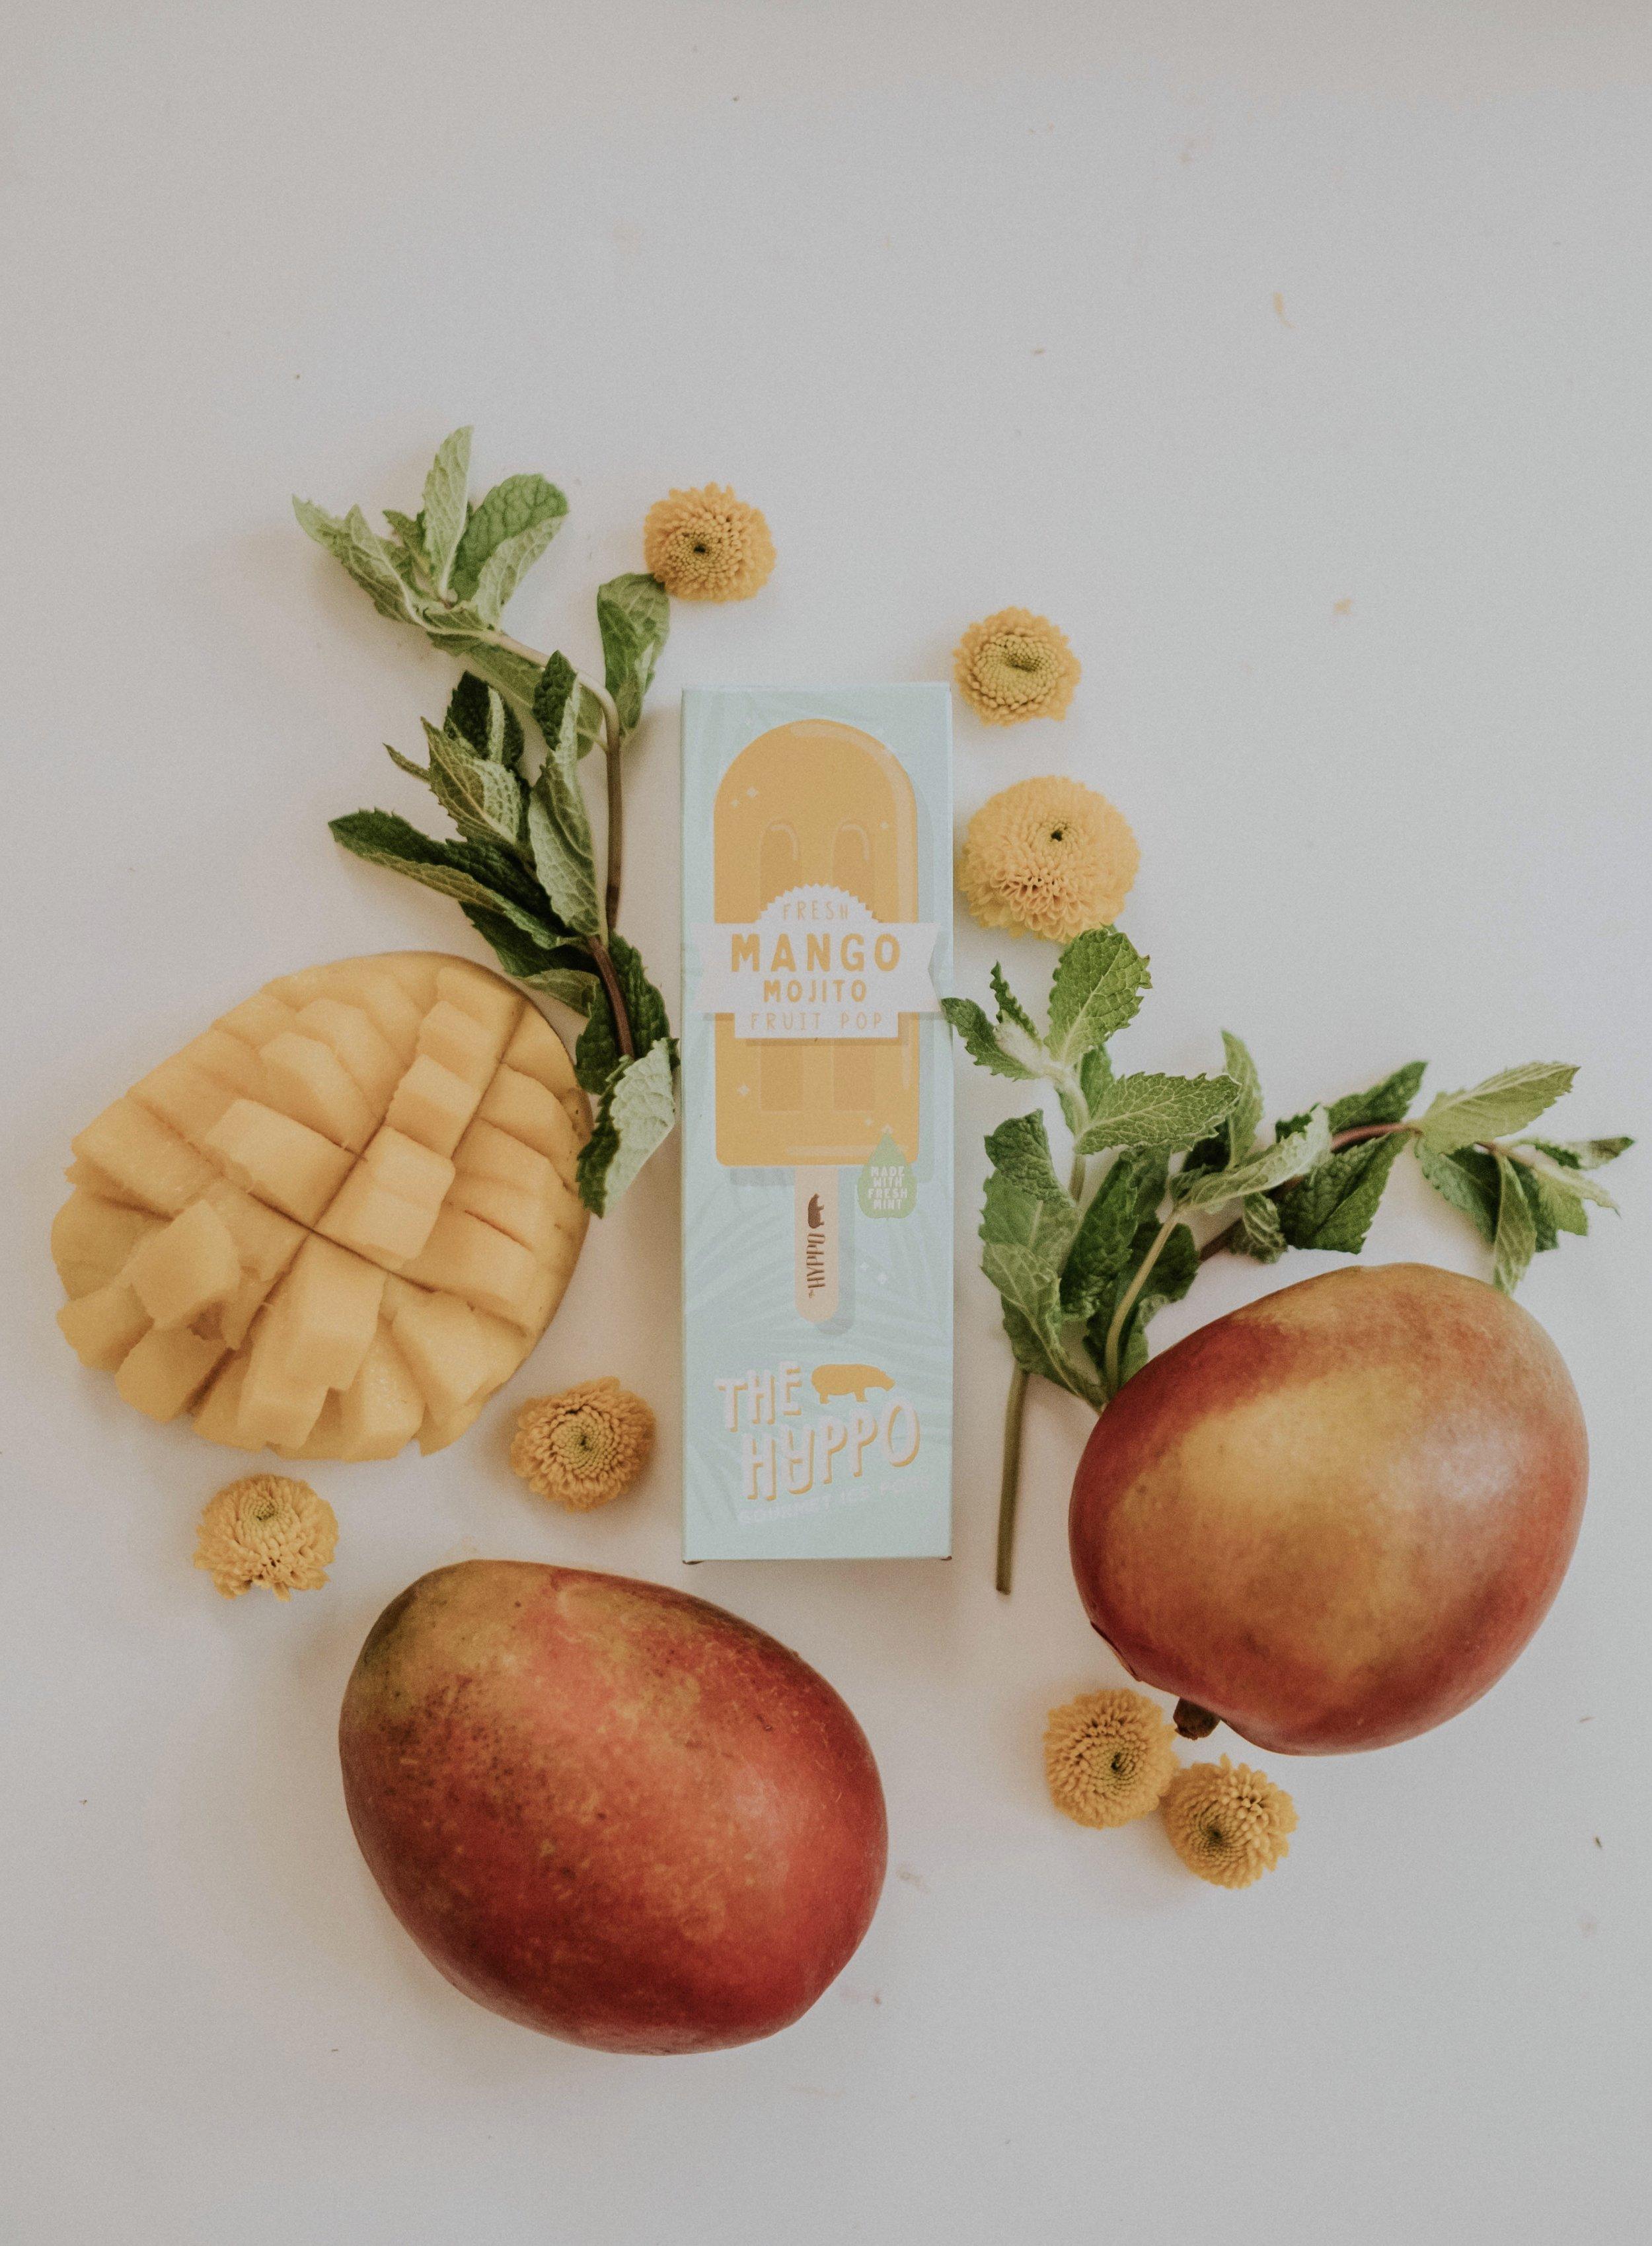 Mango Mojito Fruit Pop: Amanda's favorite pop!